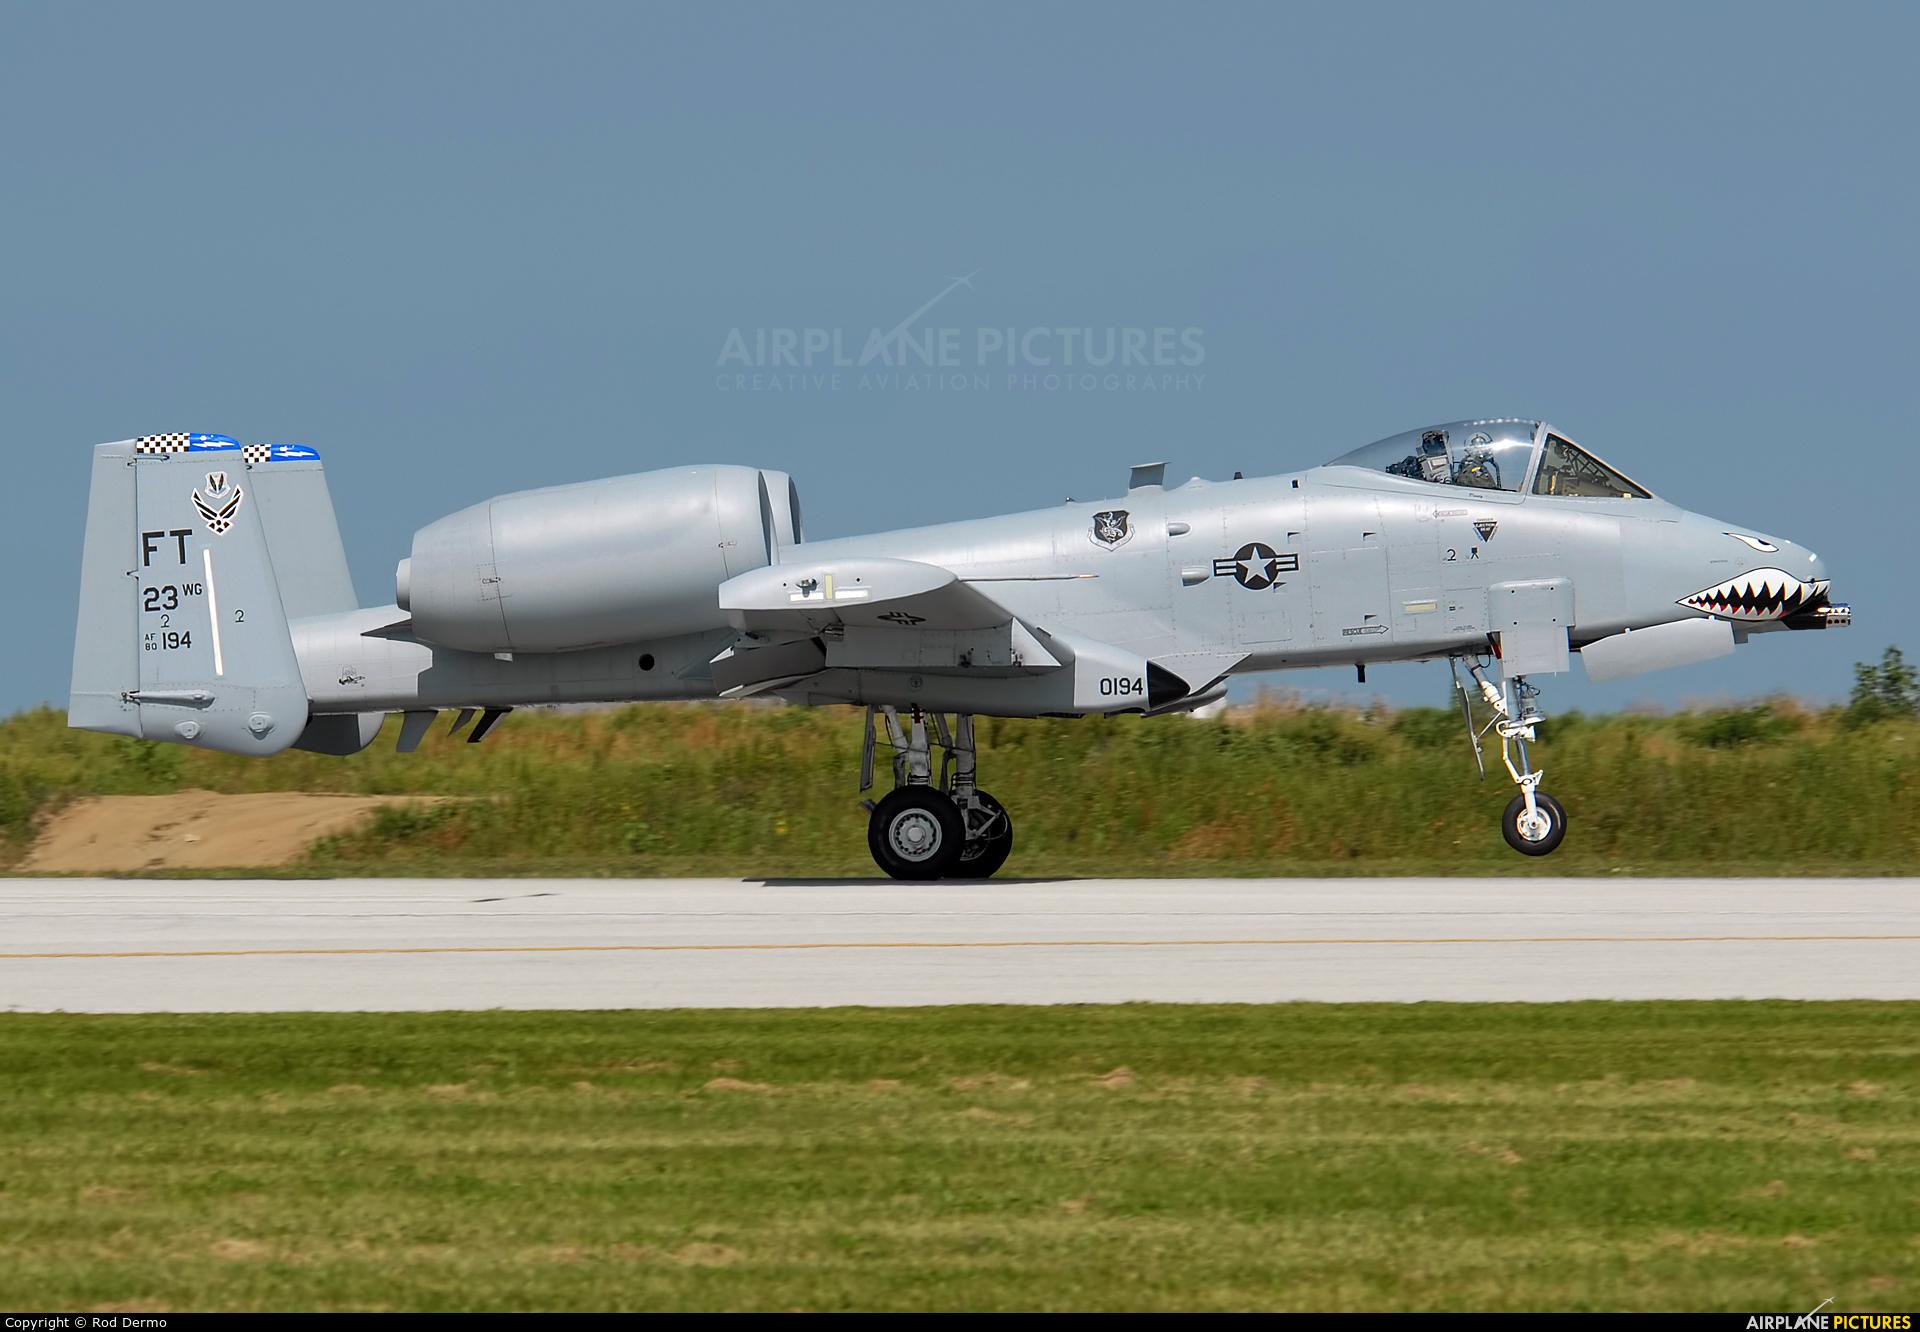 USA - Air Force 80-0194 aircraft at Cleveland - Burke Lakefront